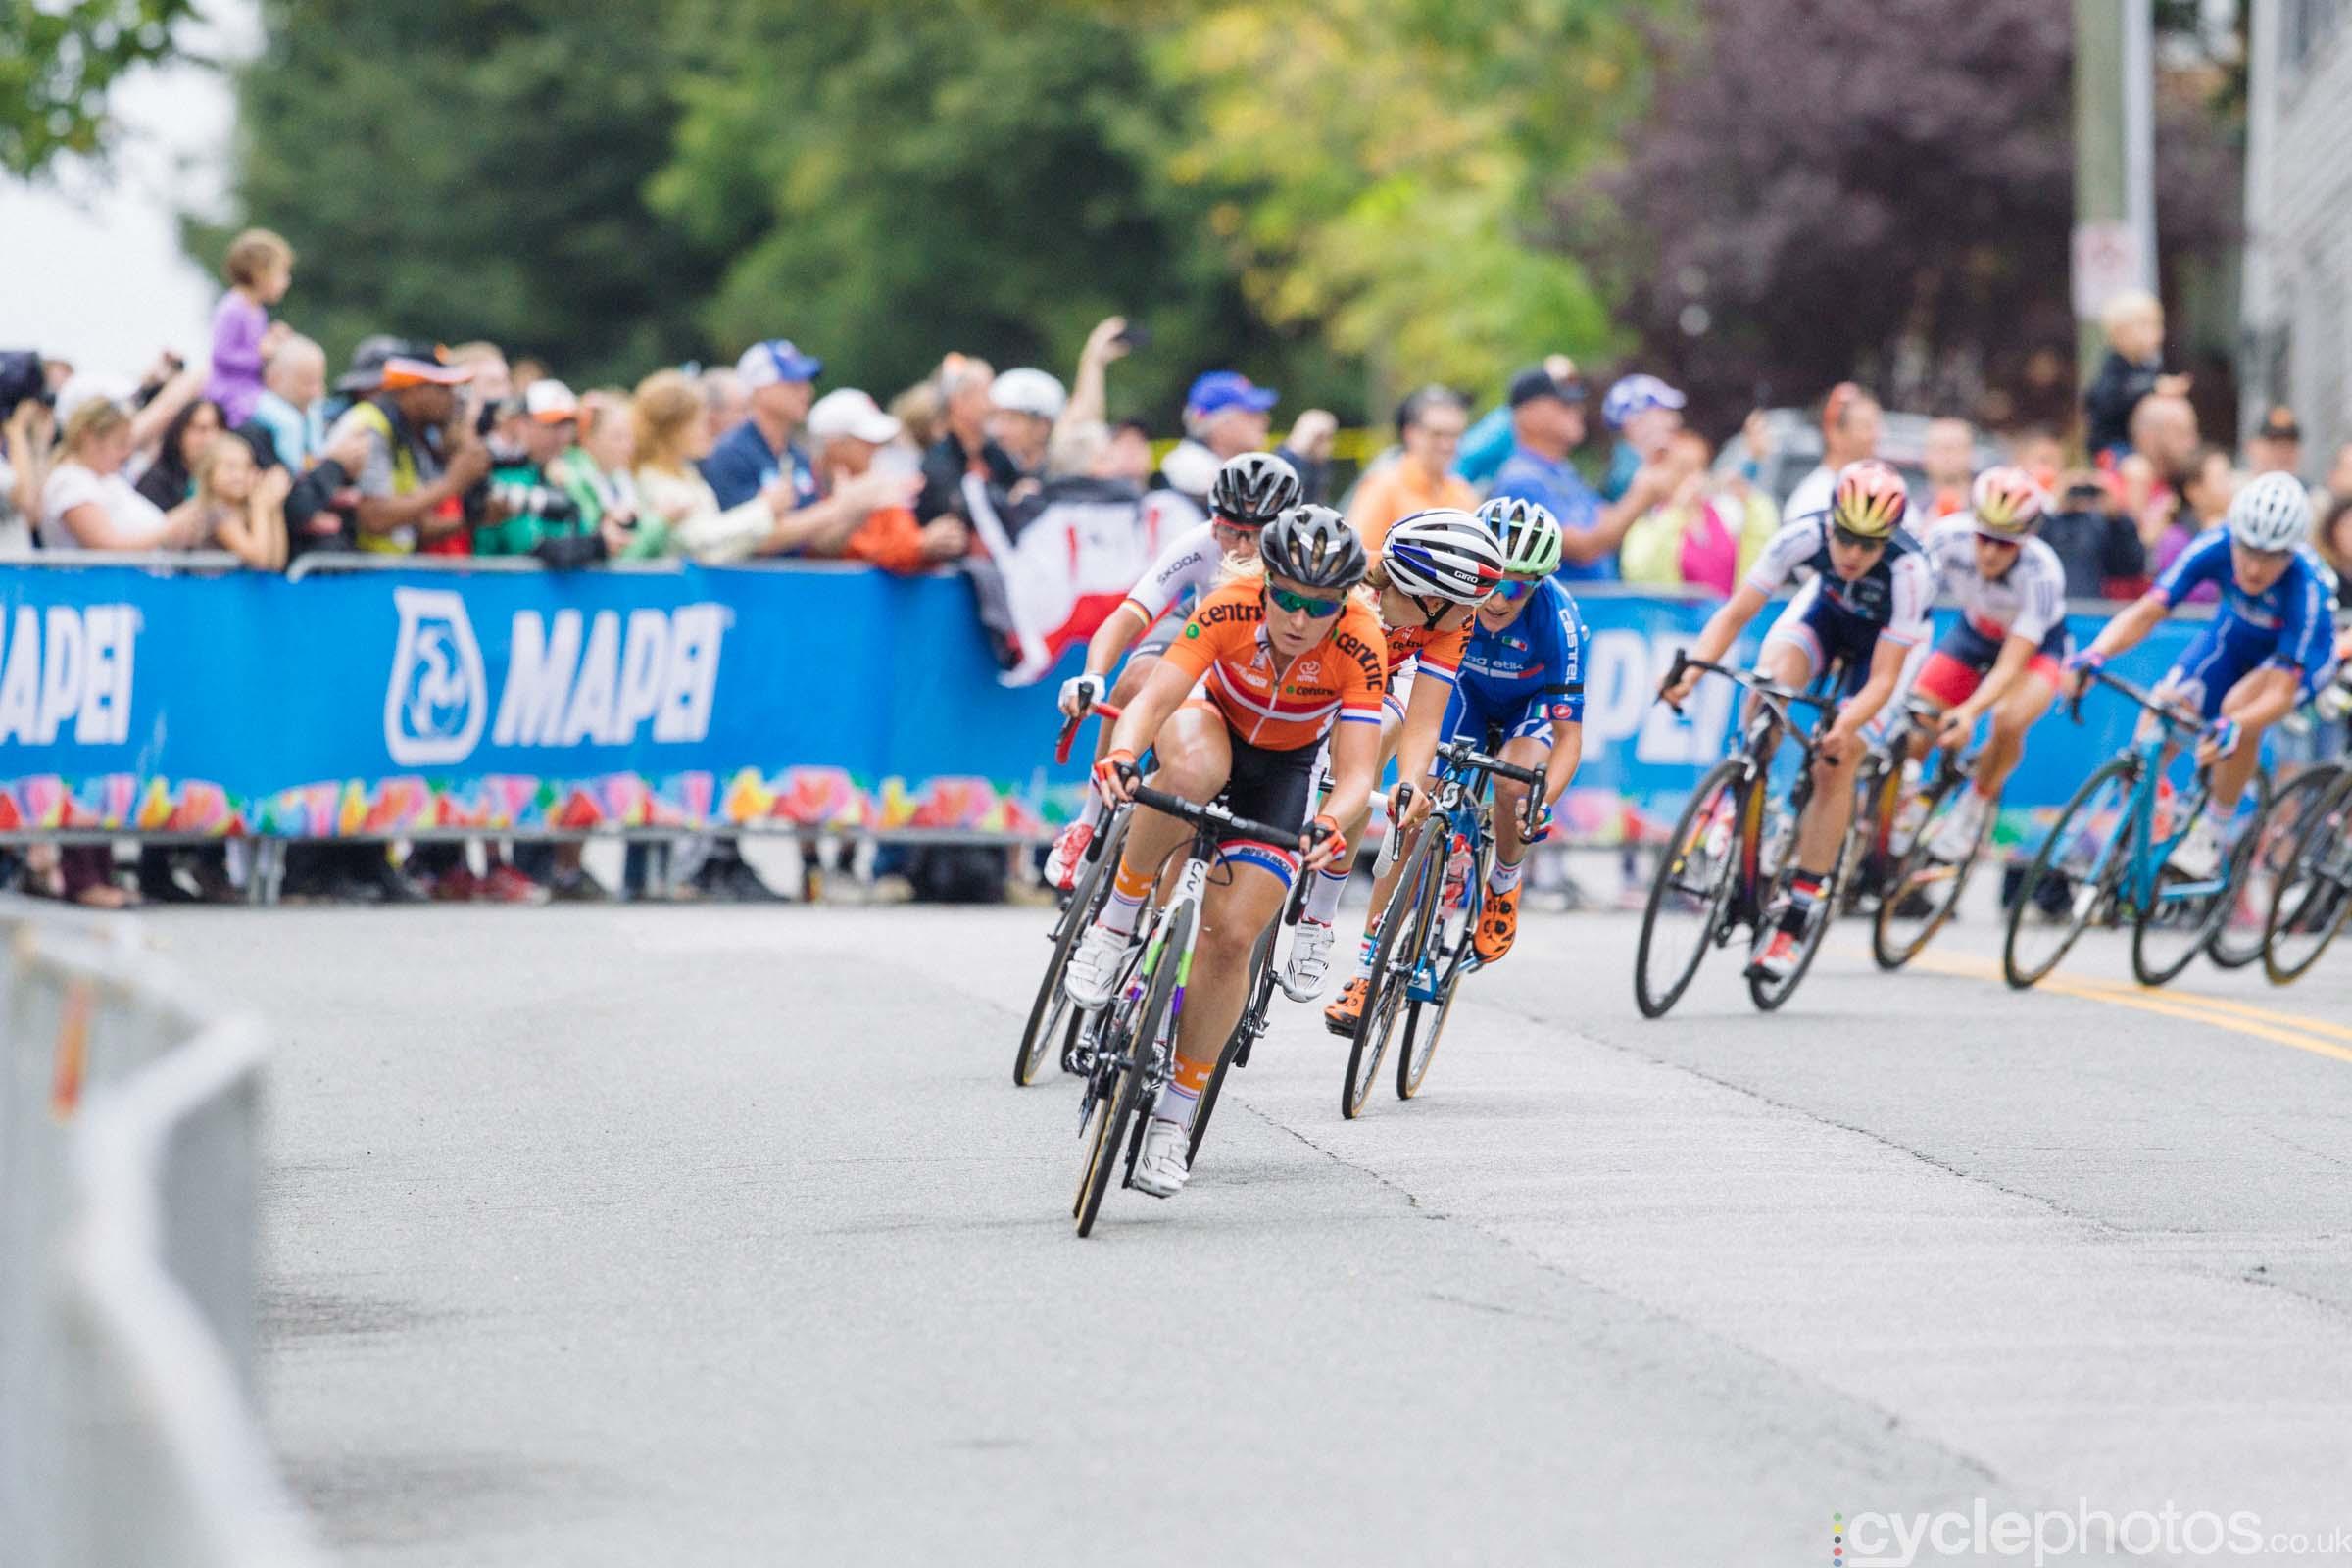 cyclephotos-world-champs-richmond-140944